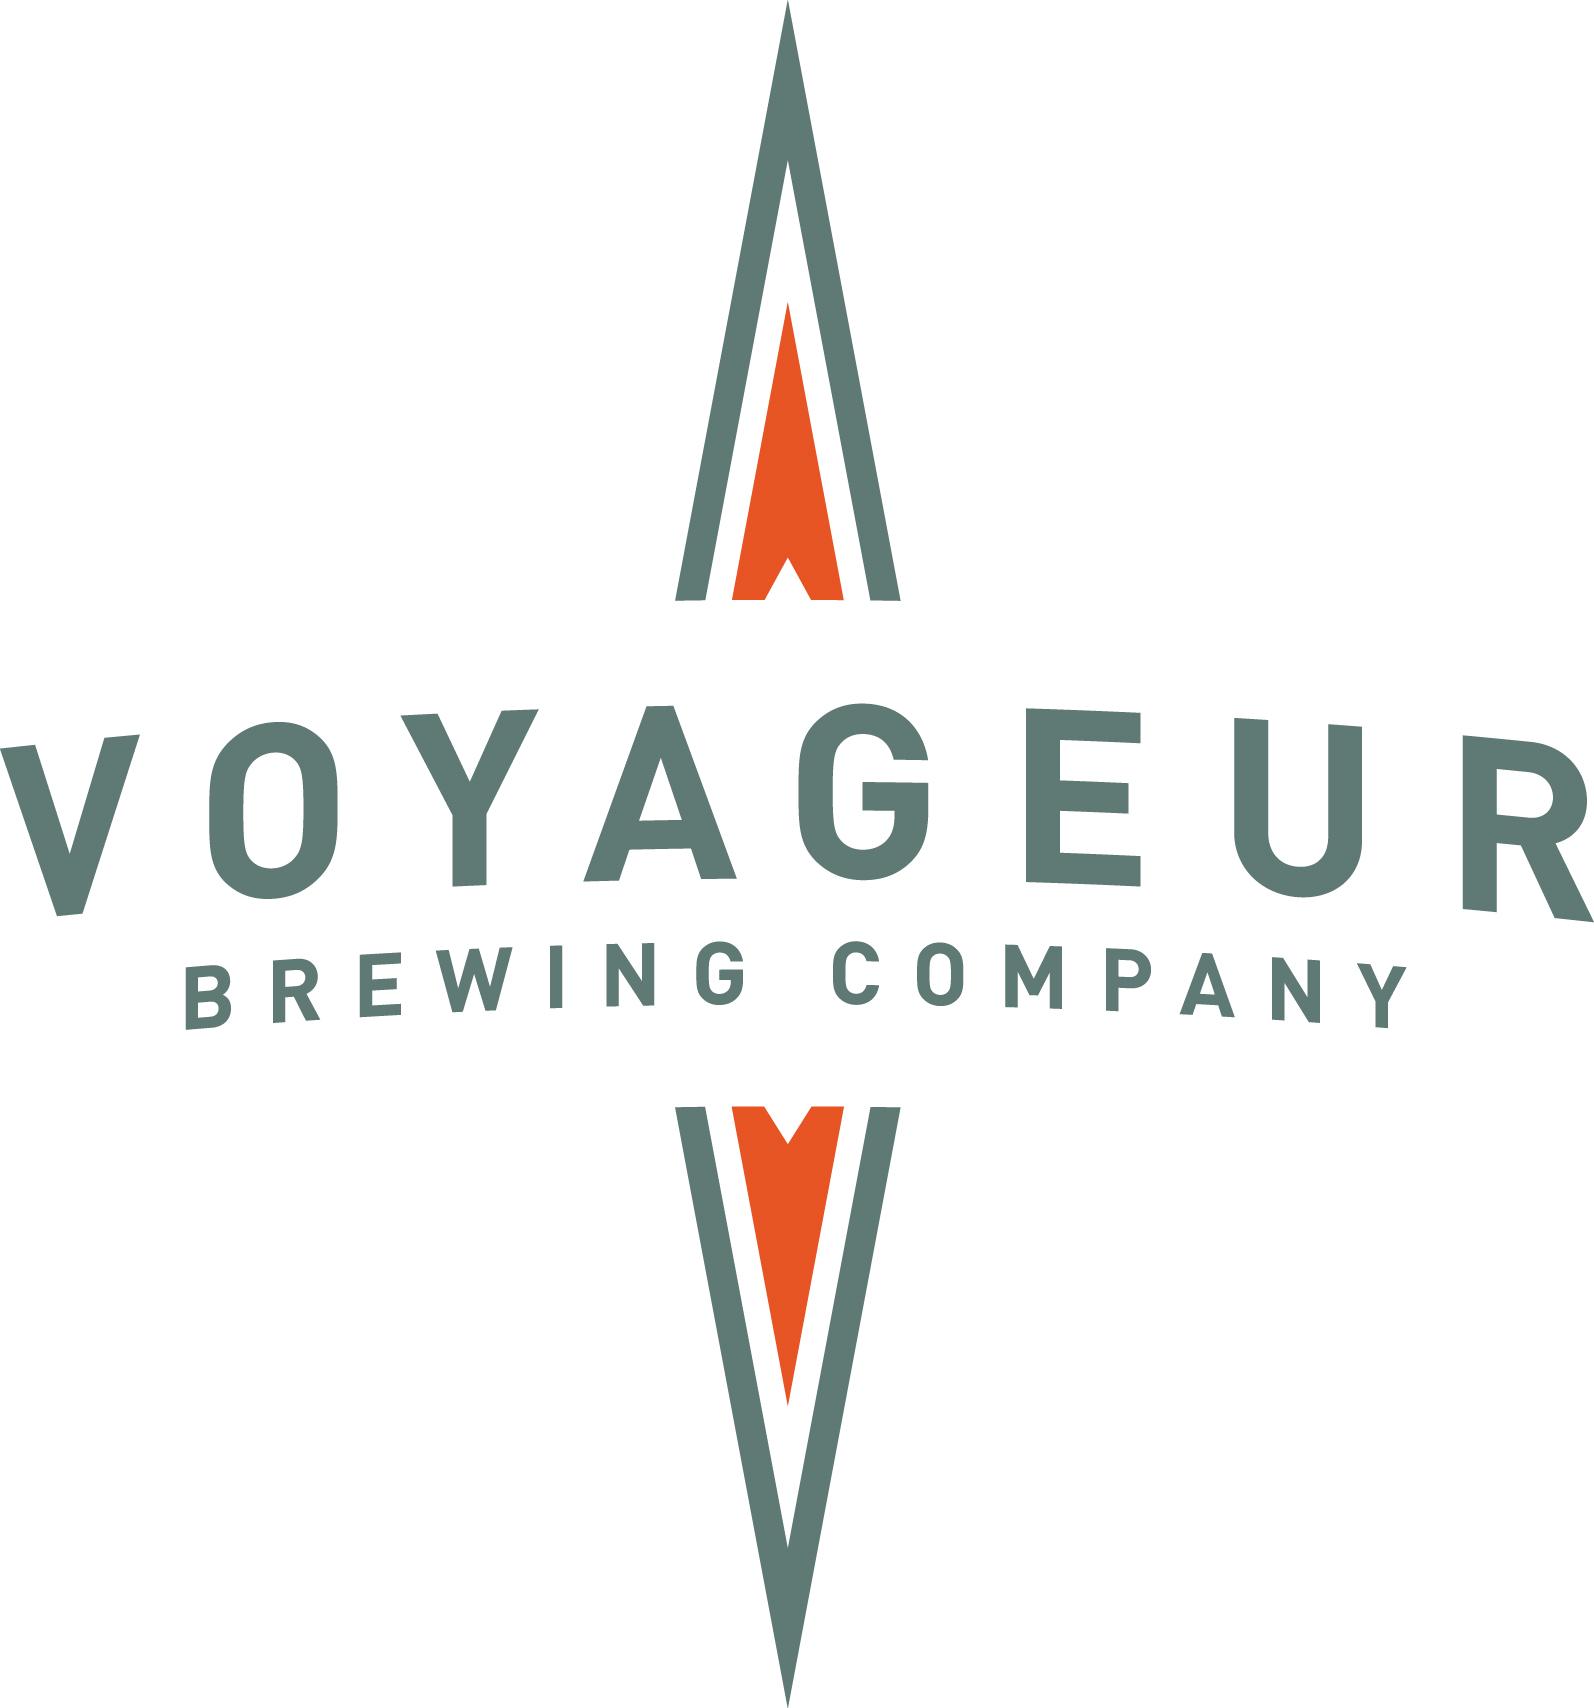 Voyageur Brewing Co